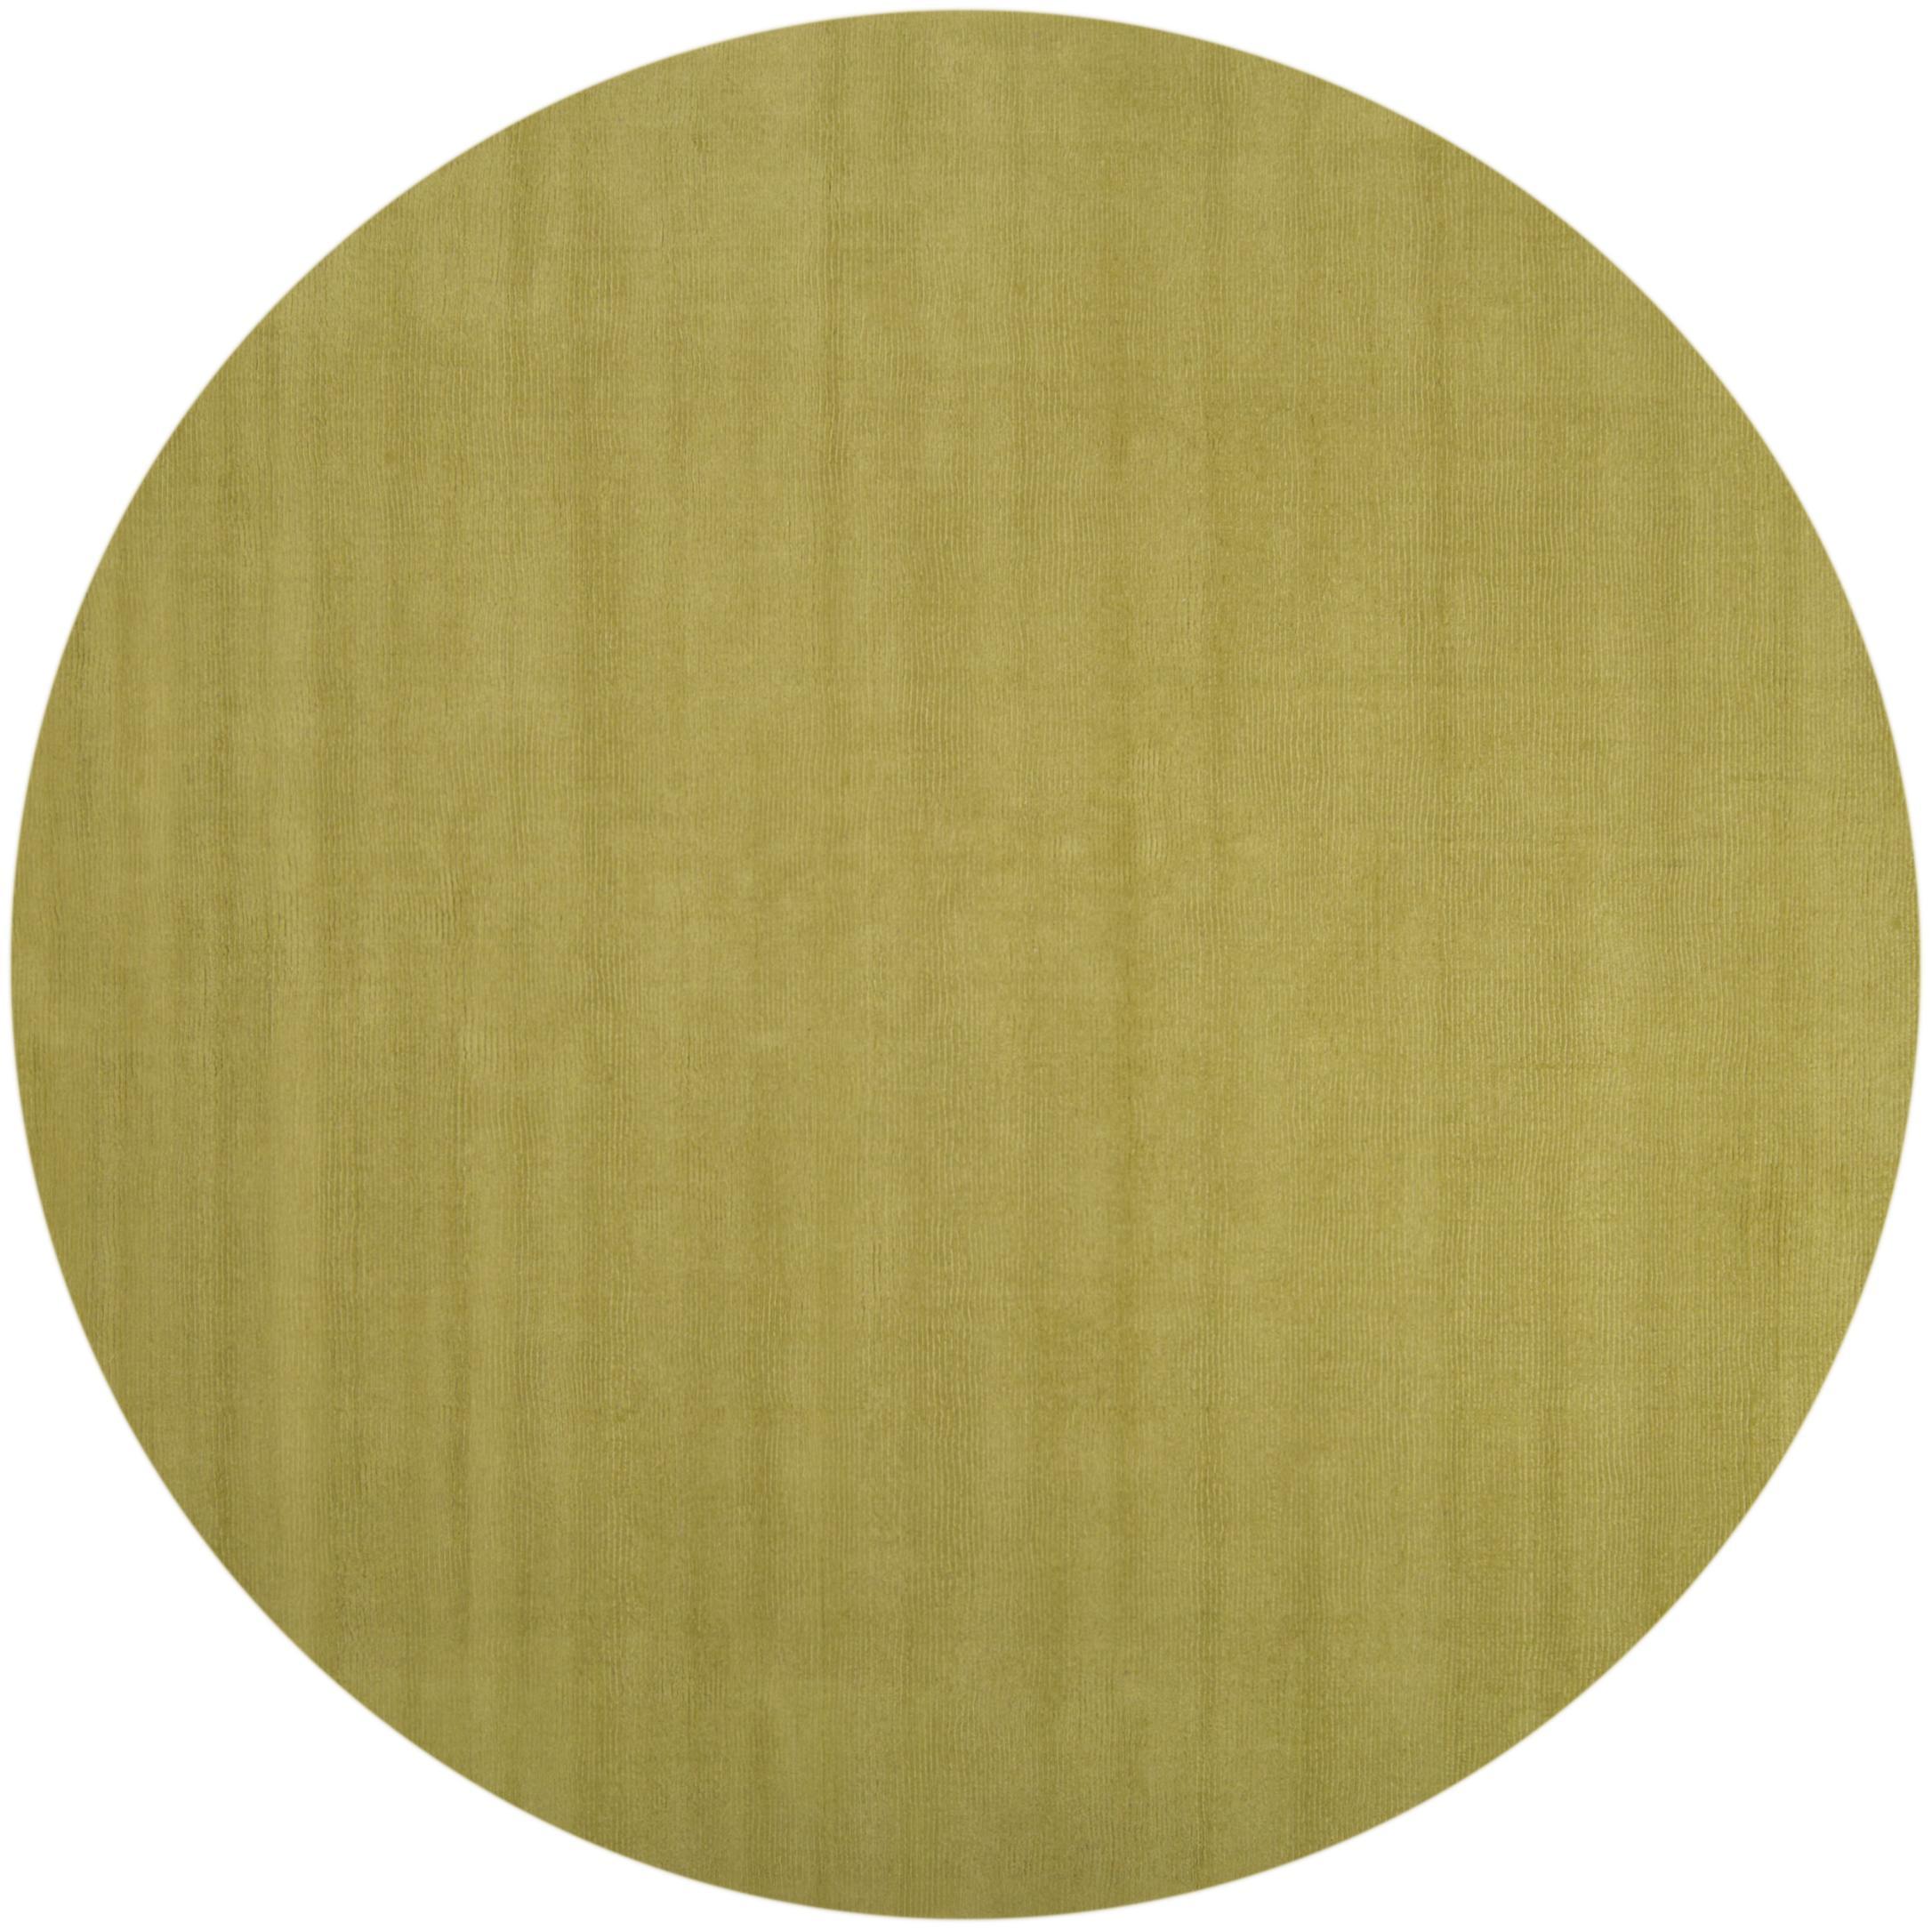 Surya Rugs Mystique 6' Round - Item Number: M337-6RD